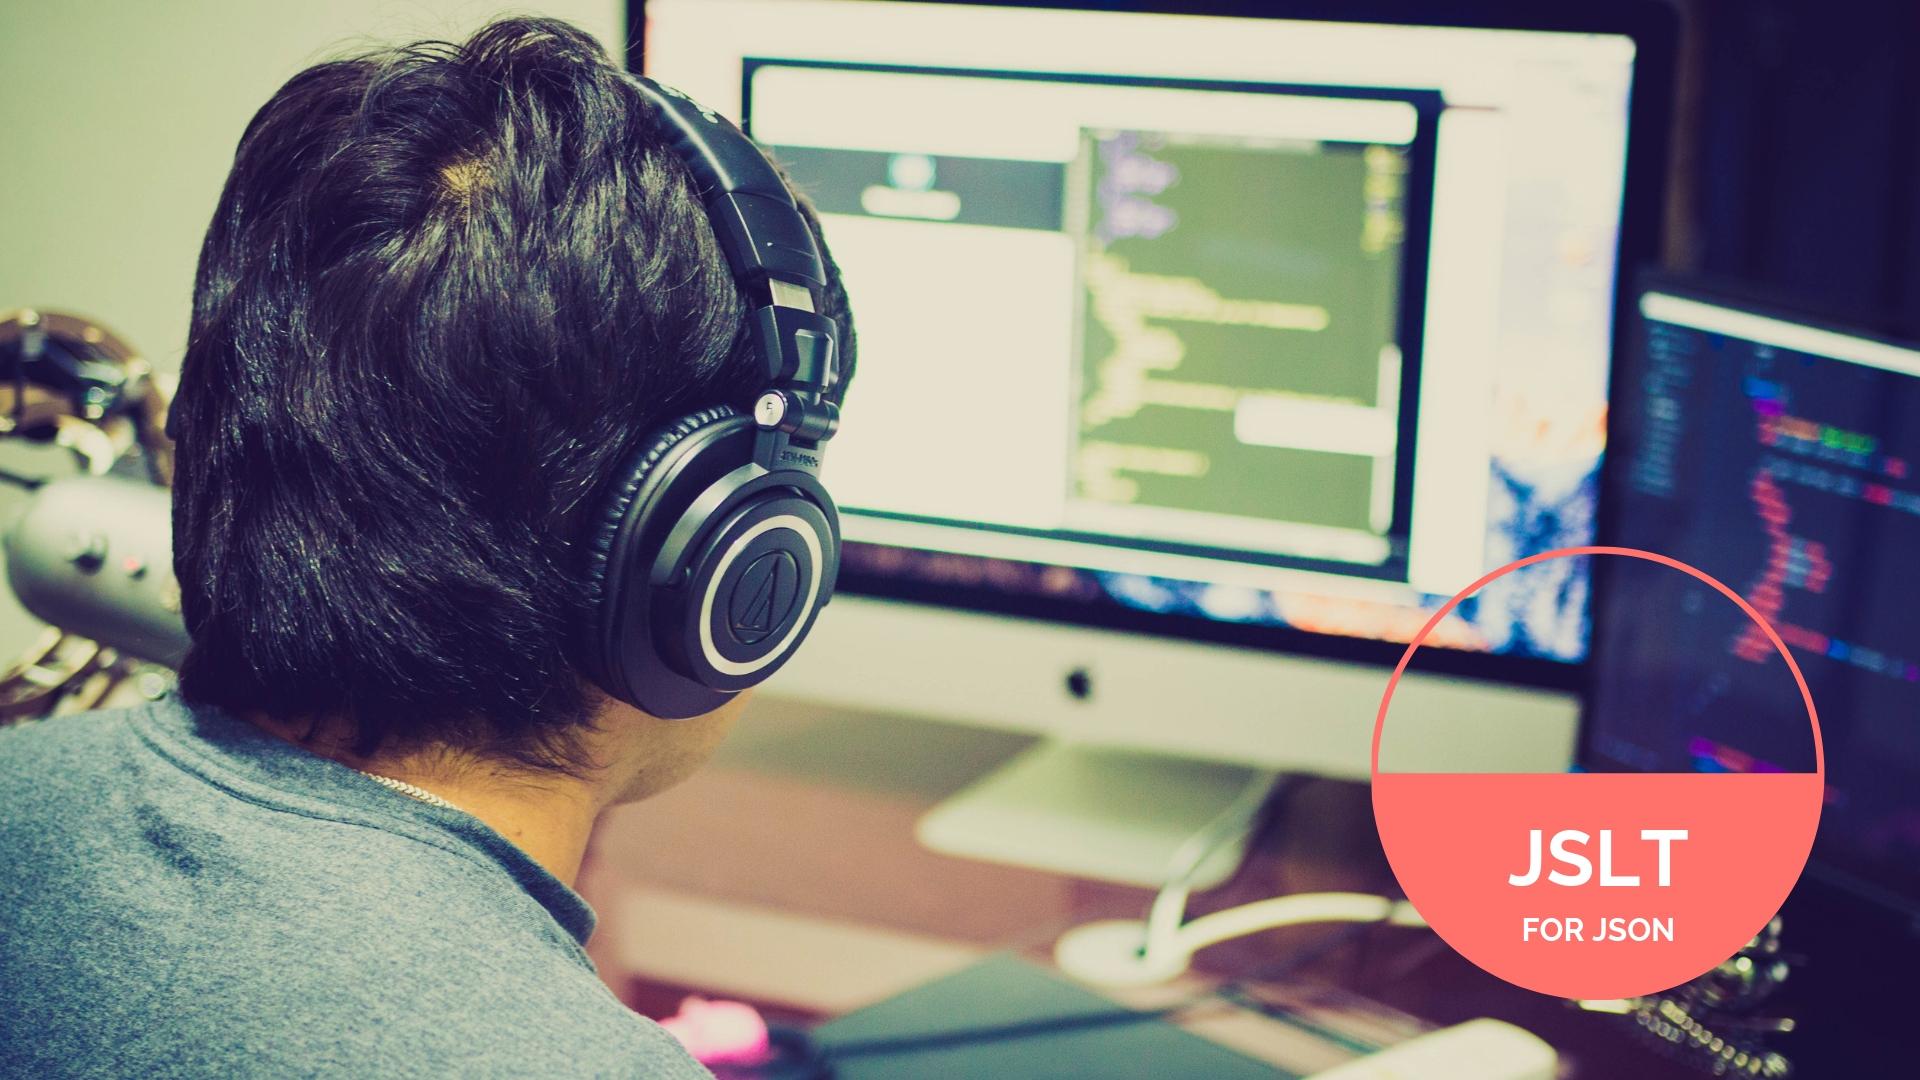 Man infront of a computer